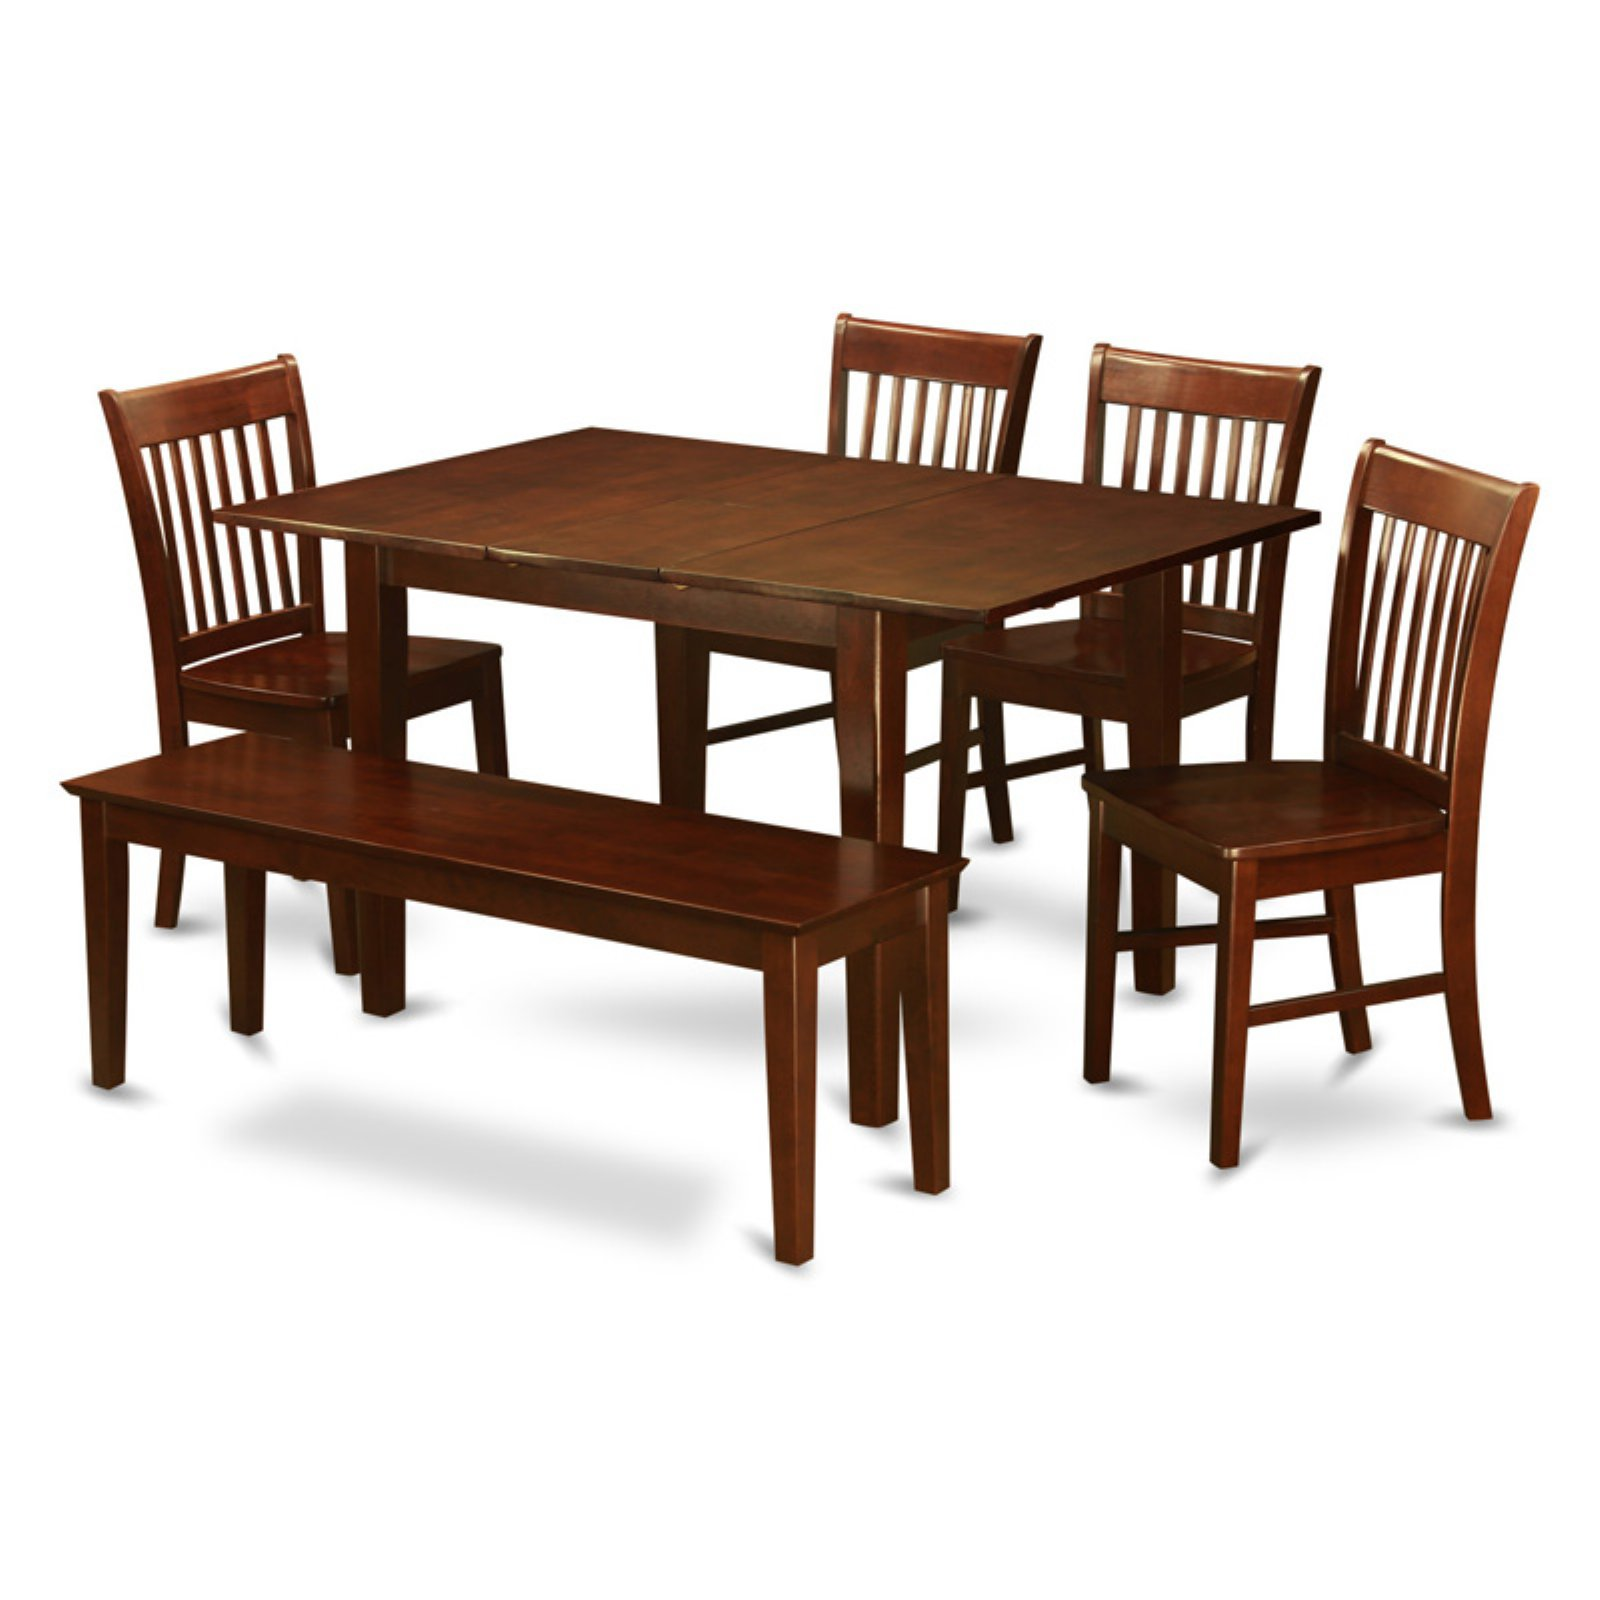 East West Furniture Picasso 6-Piece Slat Back Dining Table Set